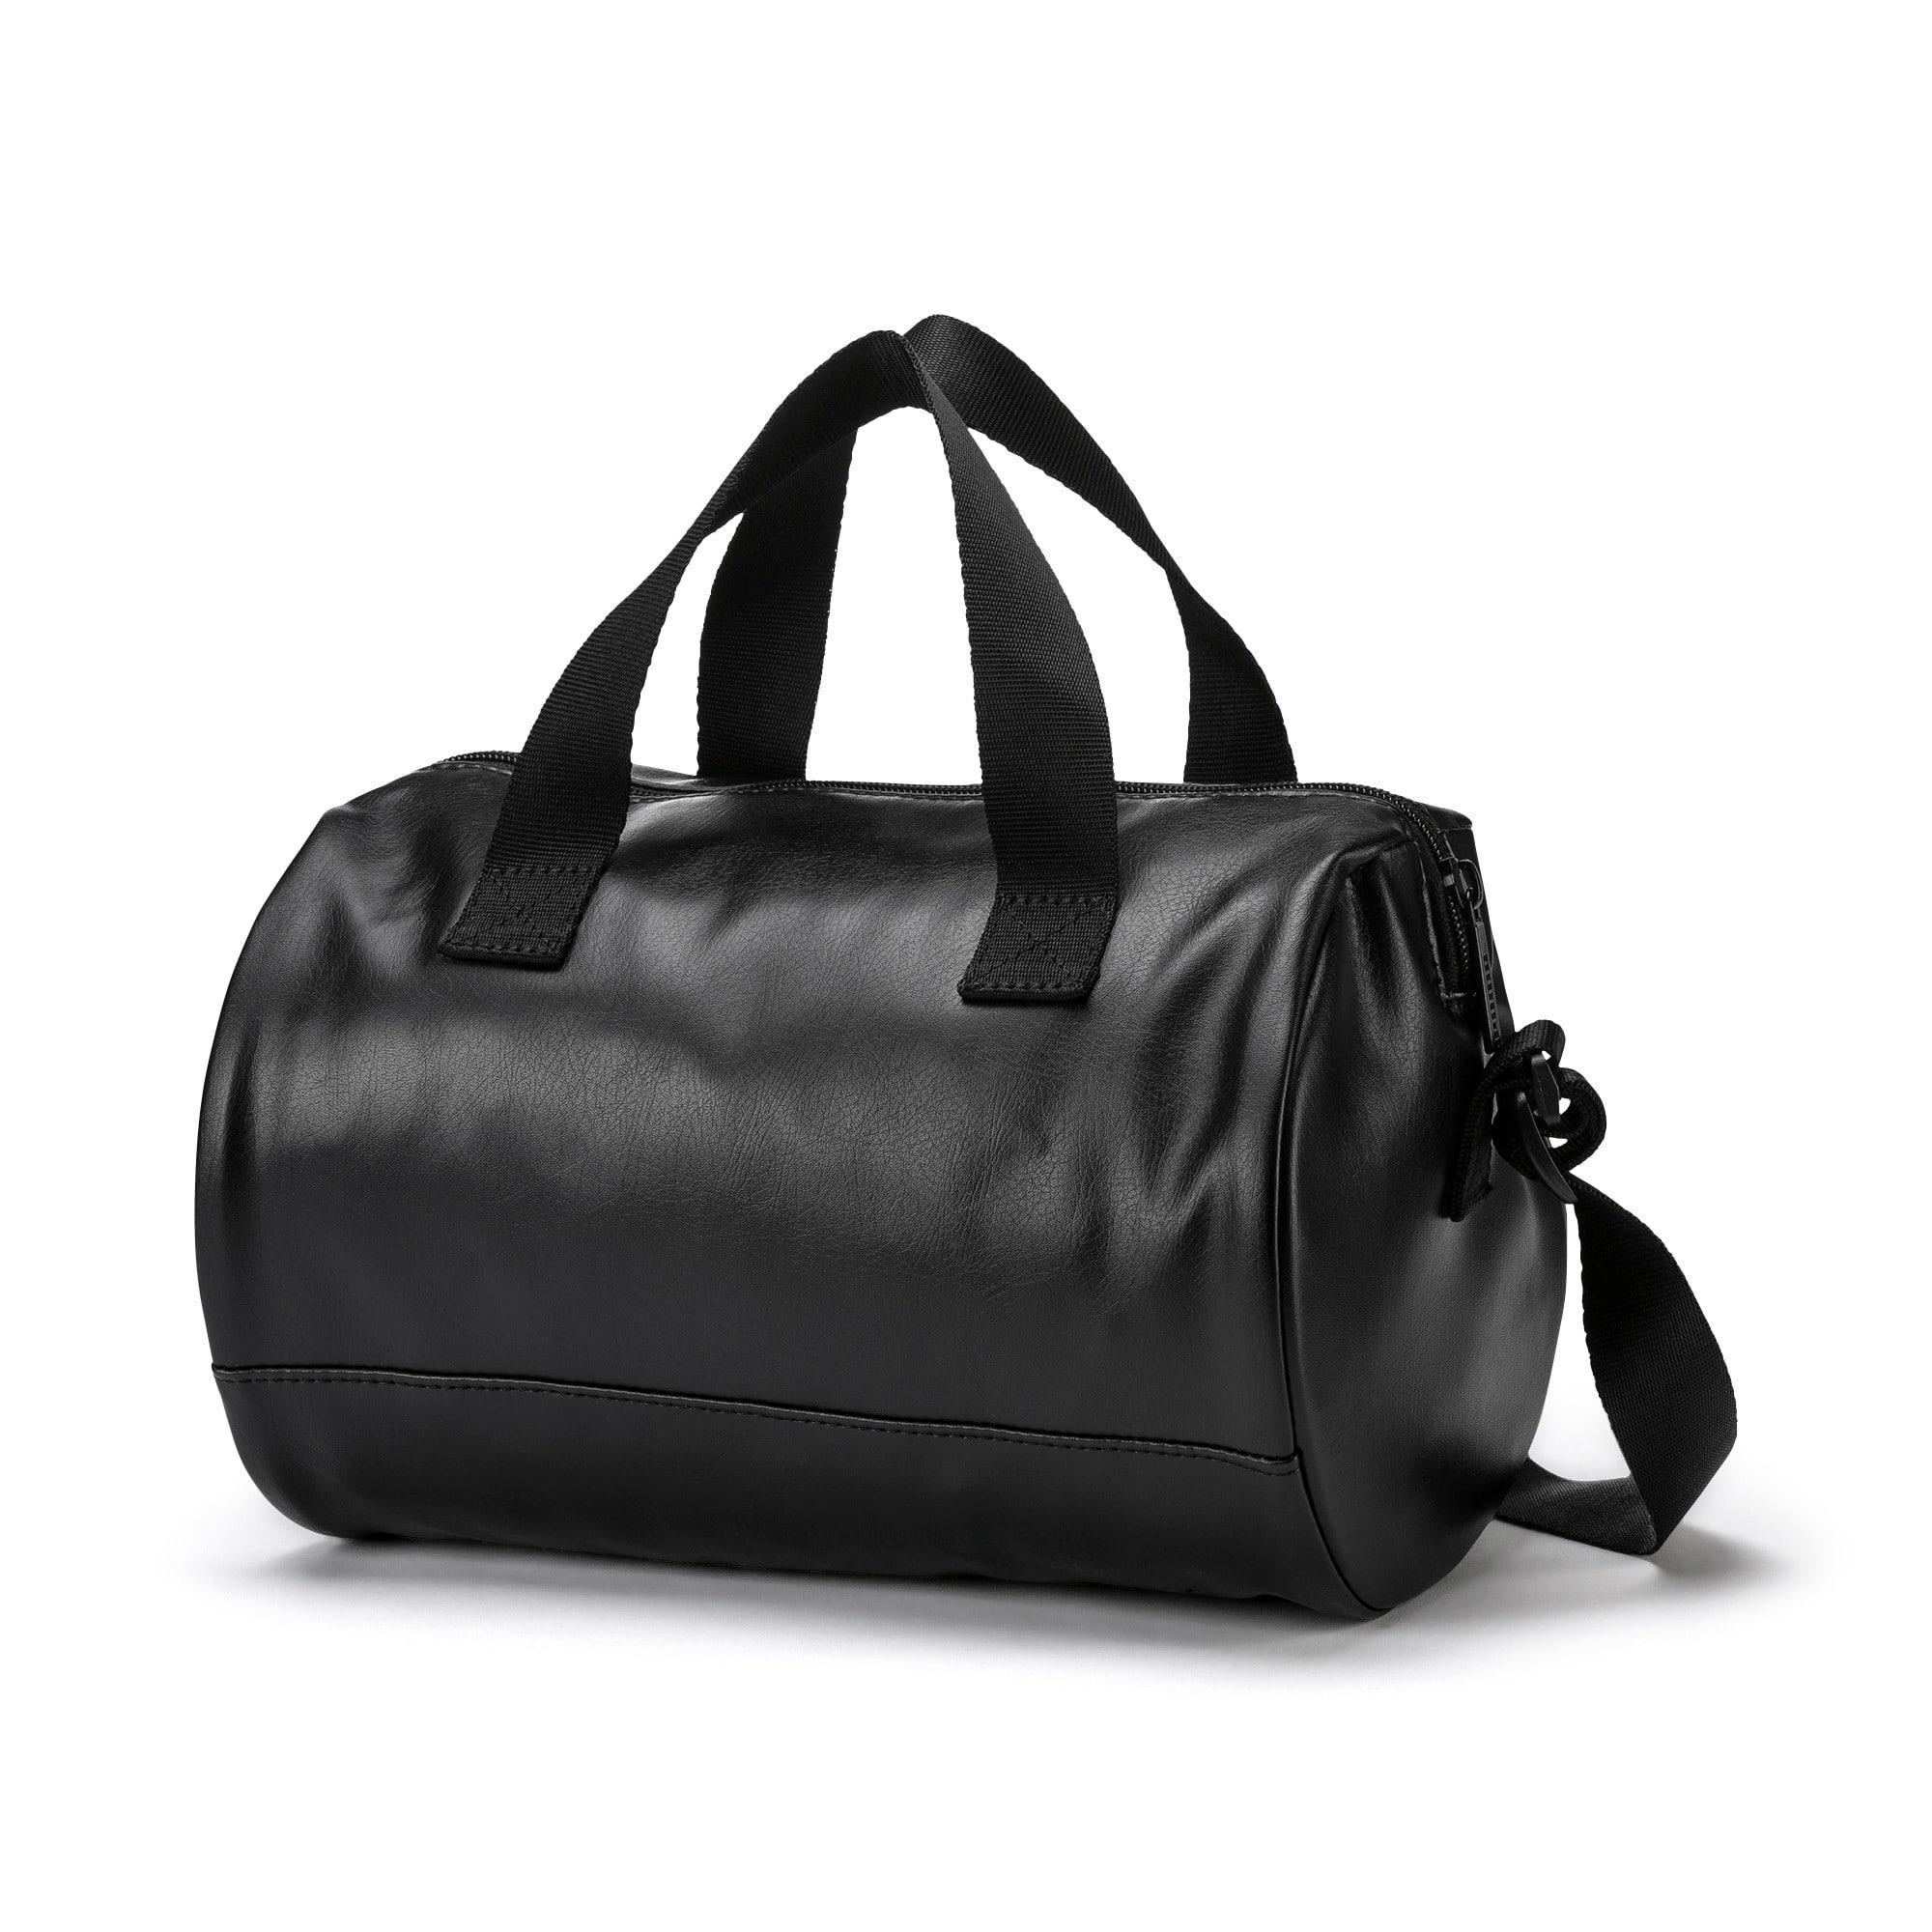 Thumbnail 3 of Up Women's Handbag, Puma Black-Gold, medium-IND